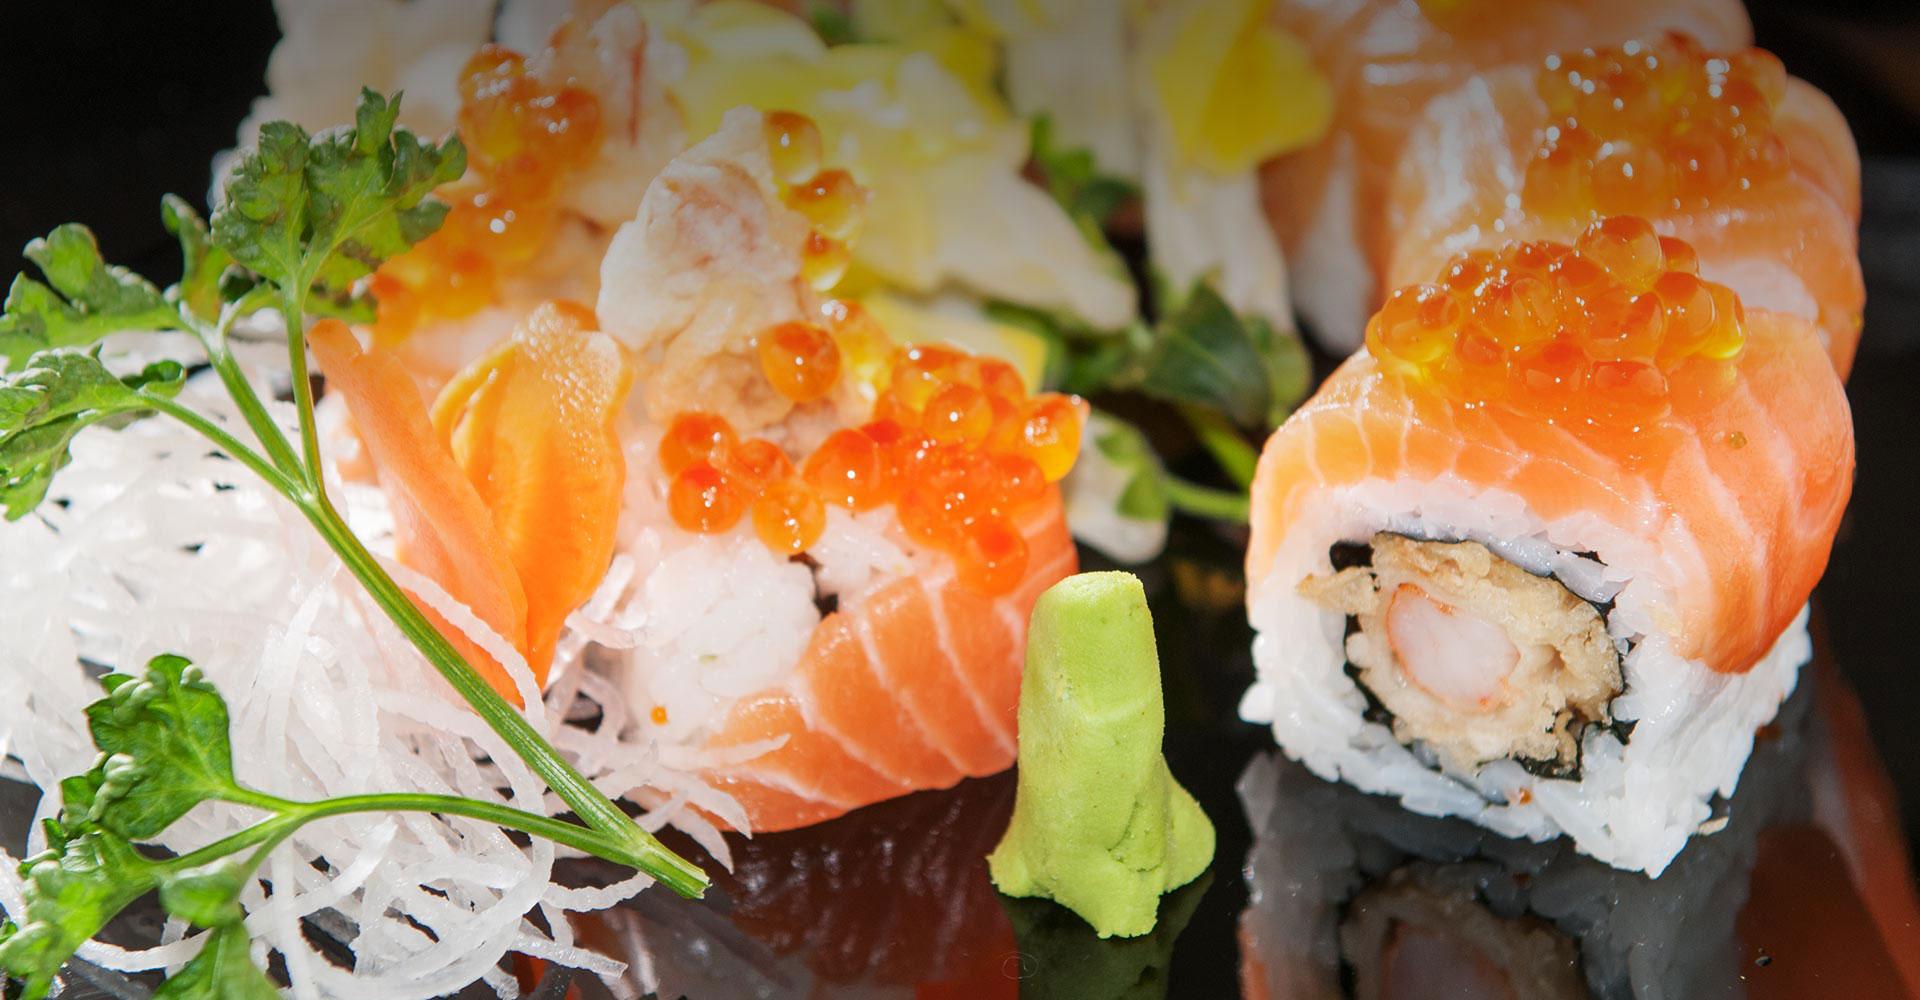 mode-sushi-take-away-consegna-ristorante-giapponese-padova-slide1